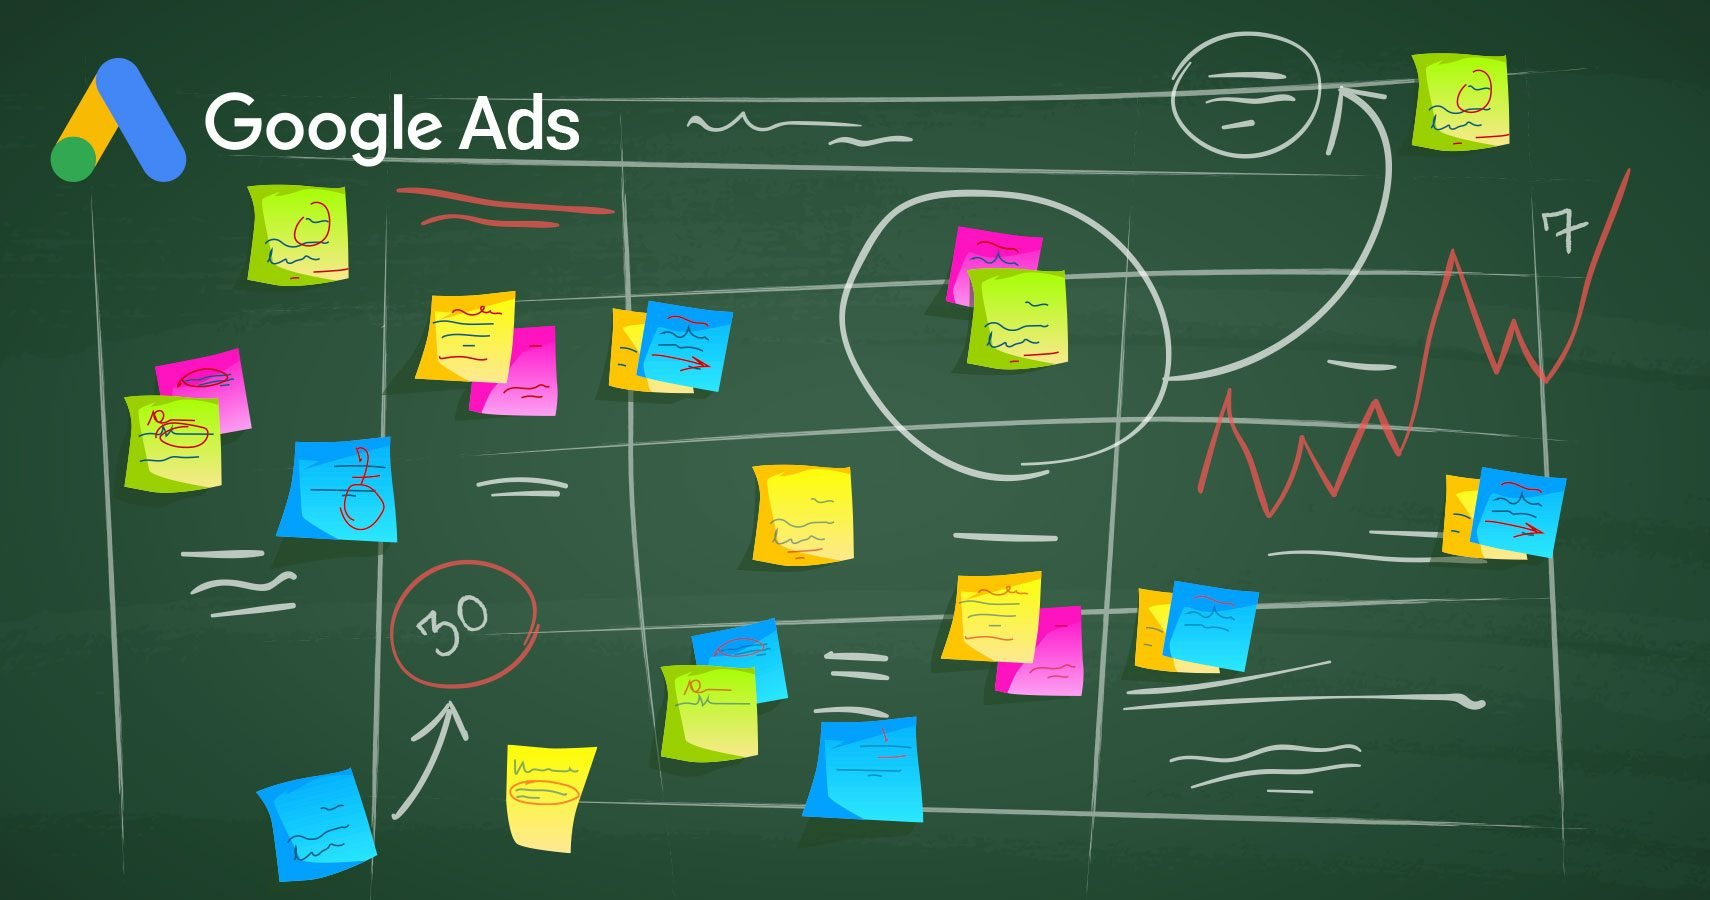 adseed - Google Ads Gebotsstrategien